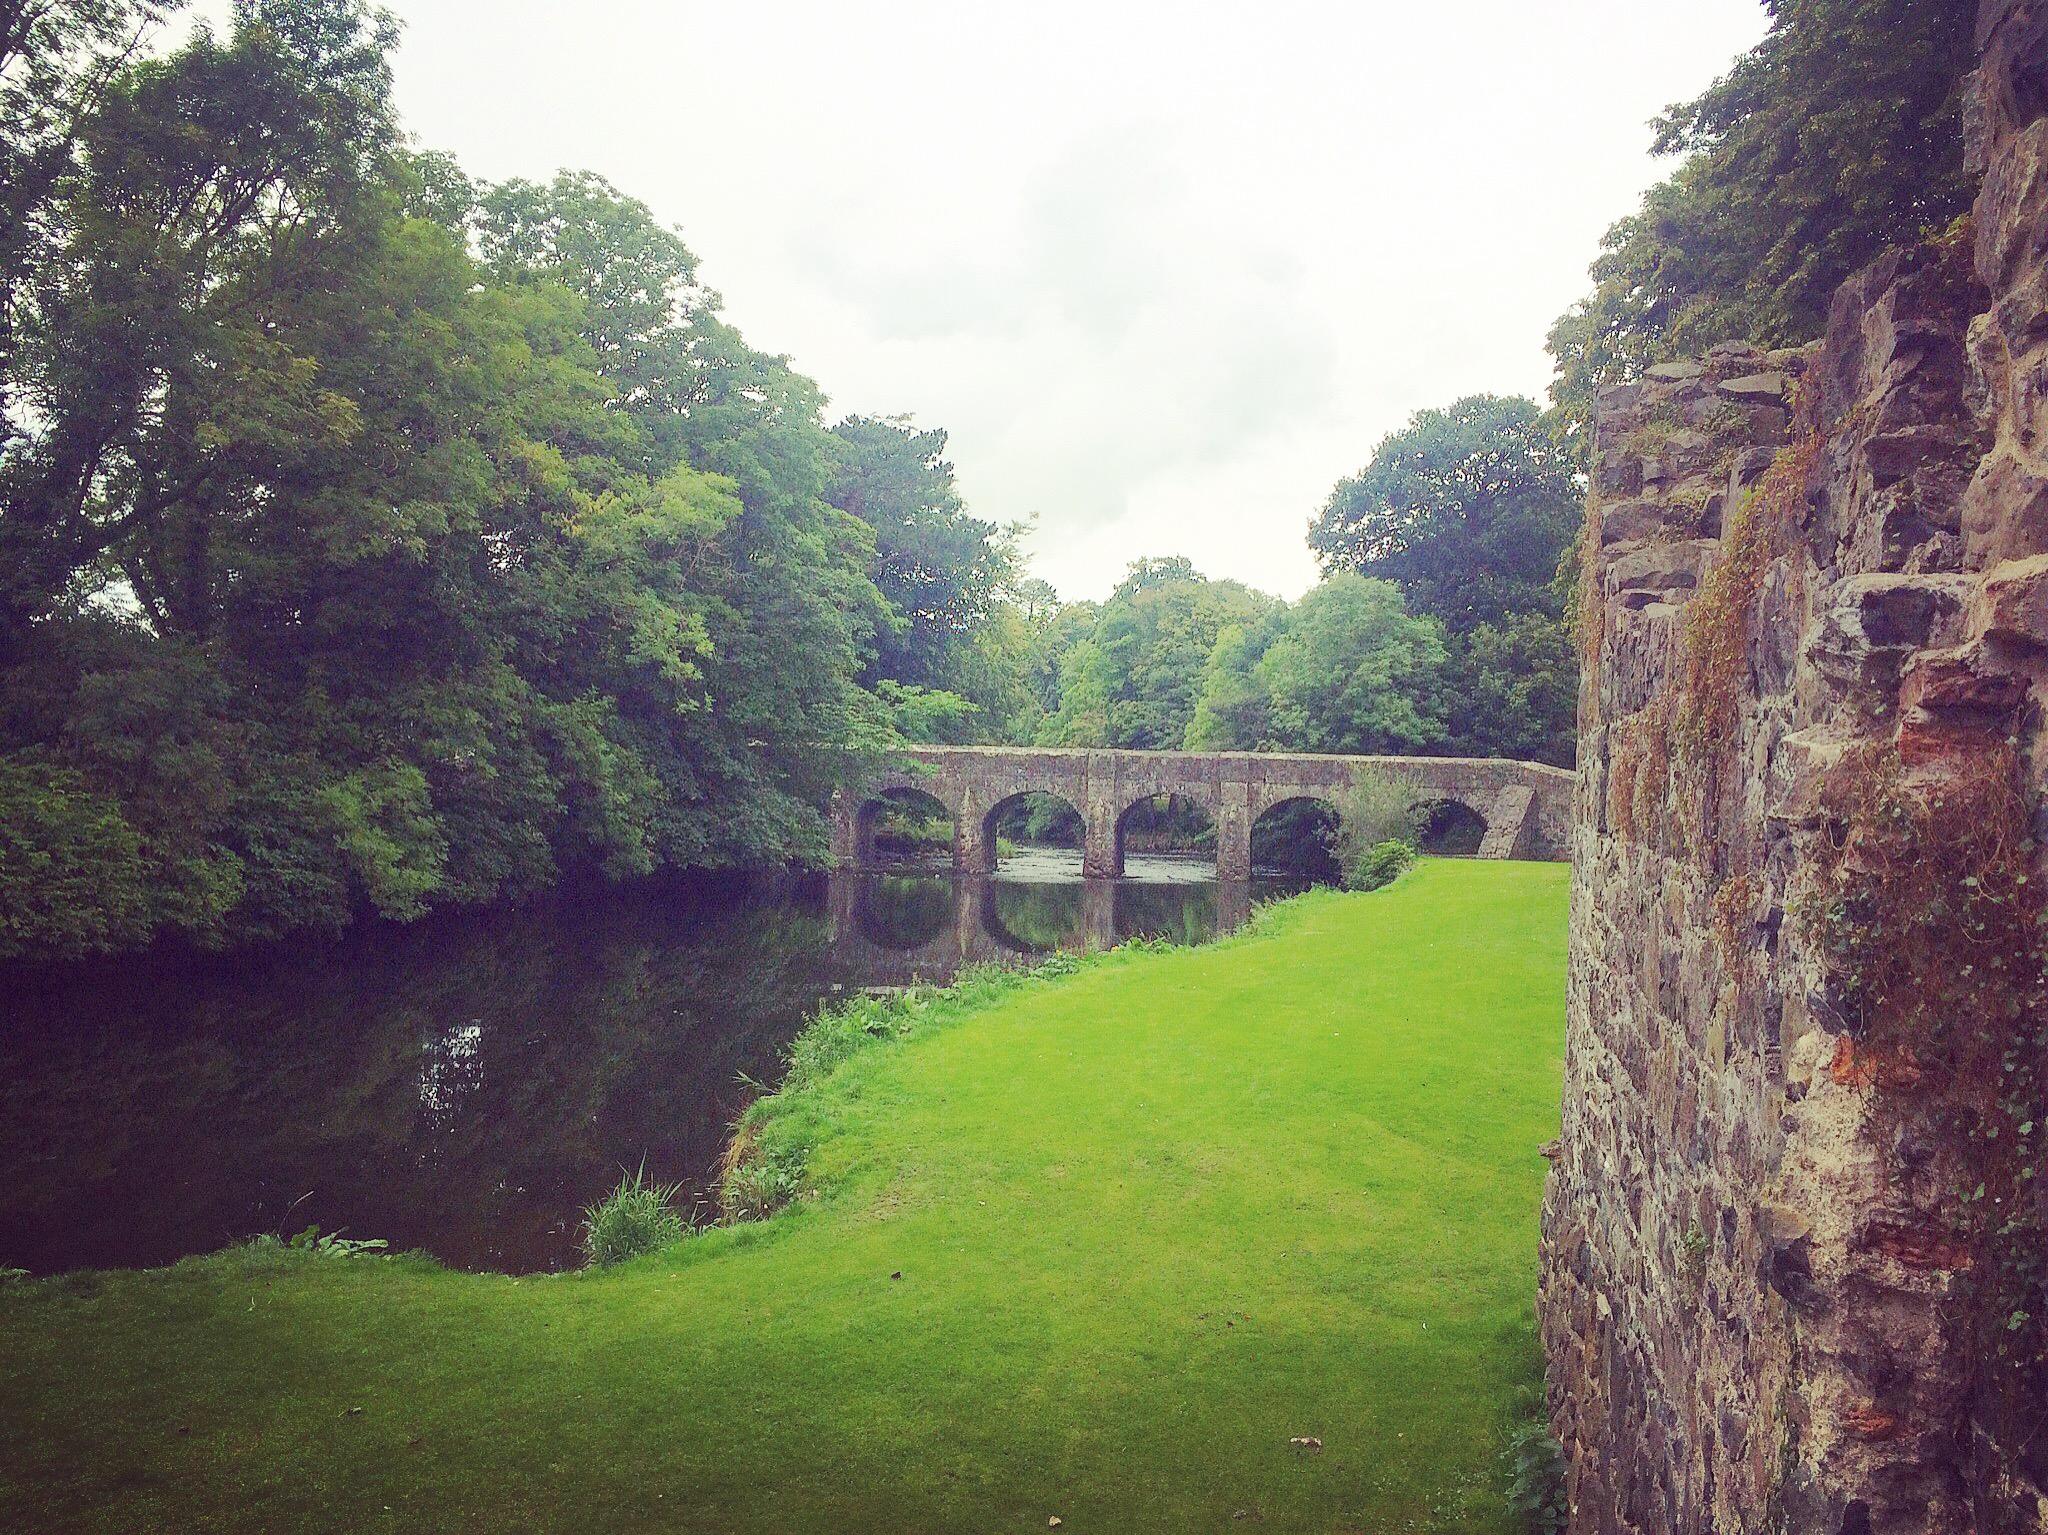 motte_antrim_castle_walled_garden_lough_neagh_northern_ireland_ni_explorer_niexplorer